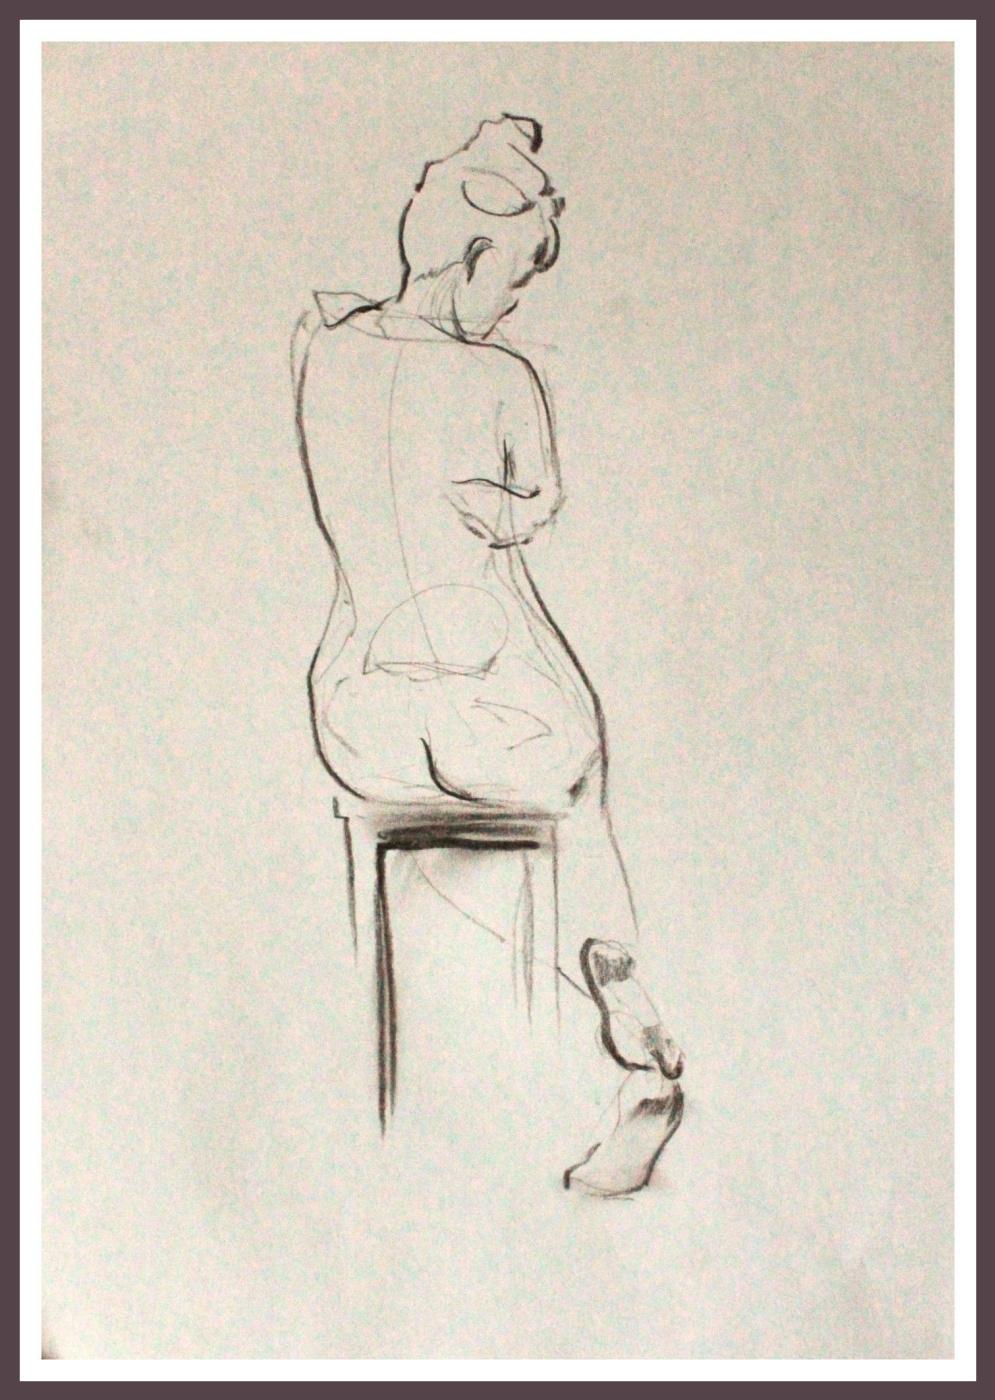 Maria Alekseevna Shiryaeva. Hug (Sketch of model)